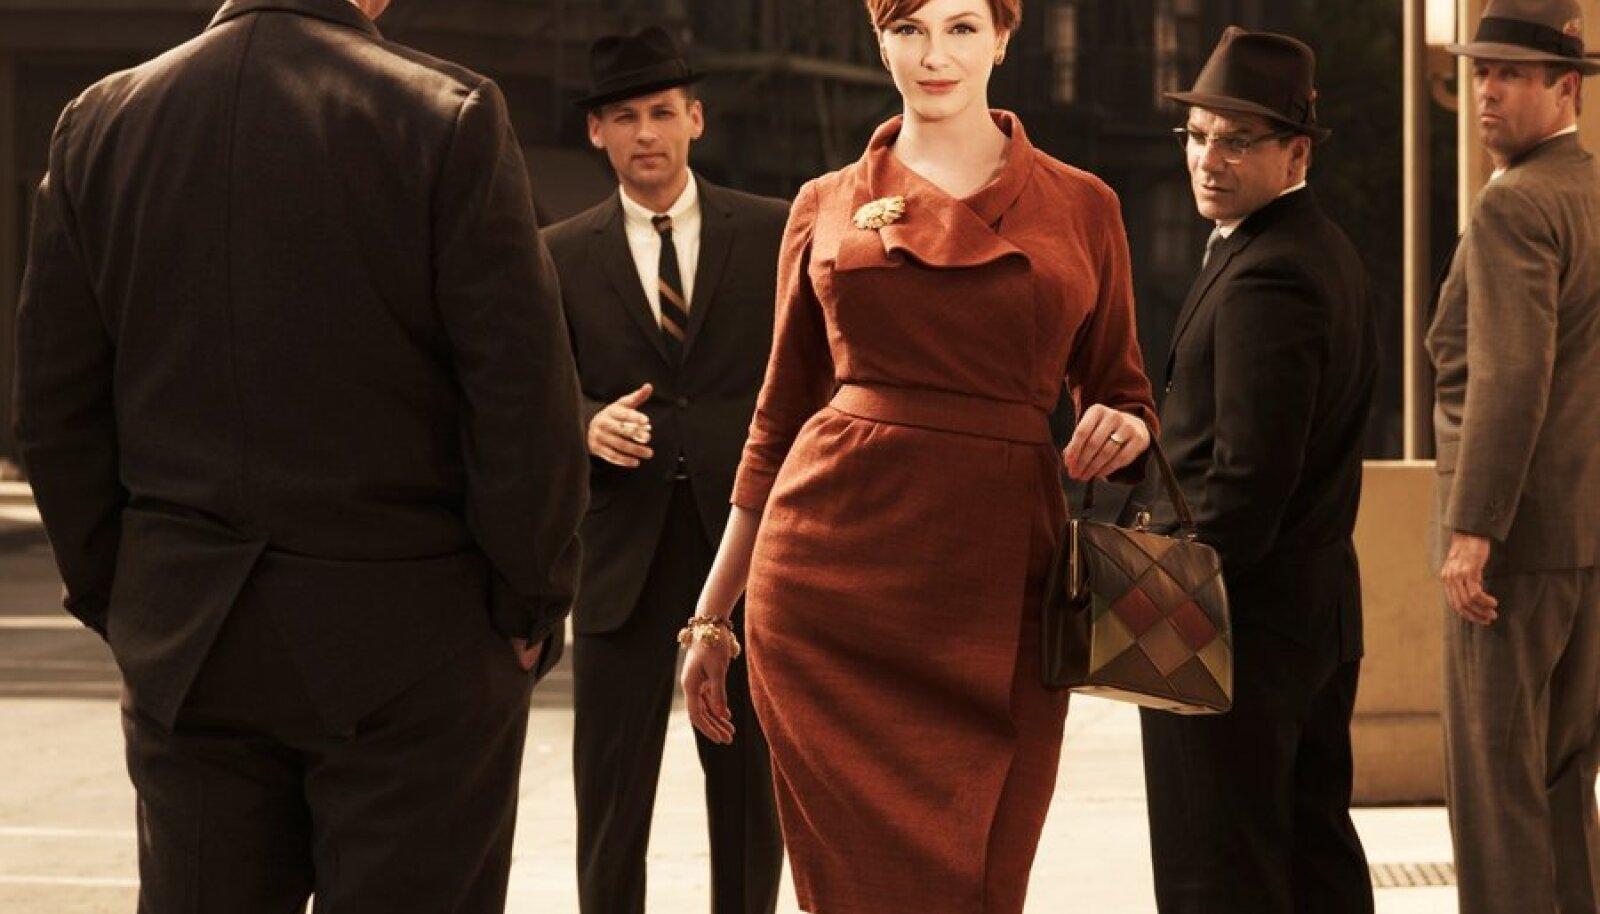 Foto: Lionsgate / Weiner Bros. & AMC / U.R.O.K.